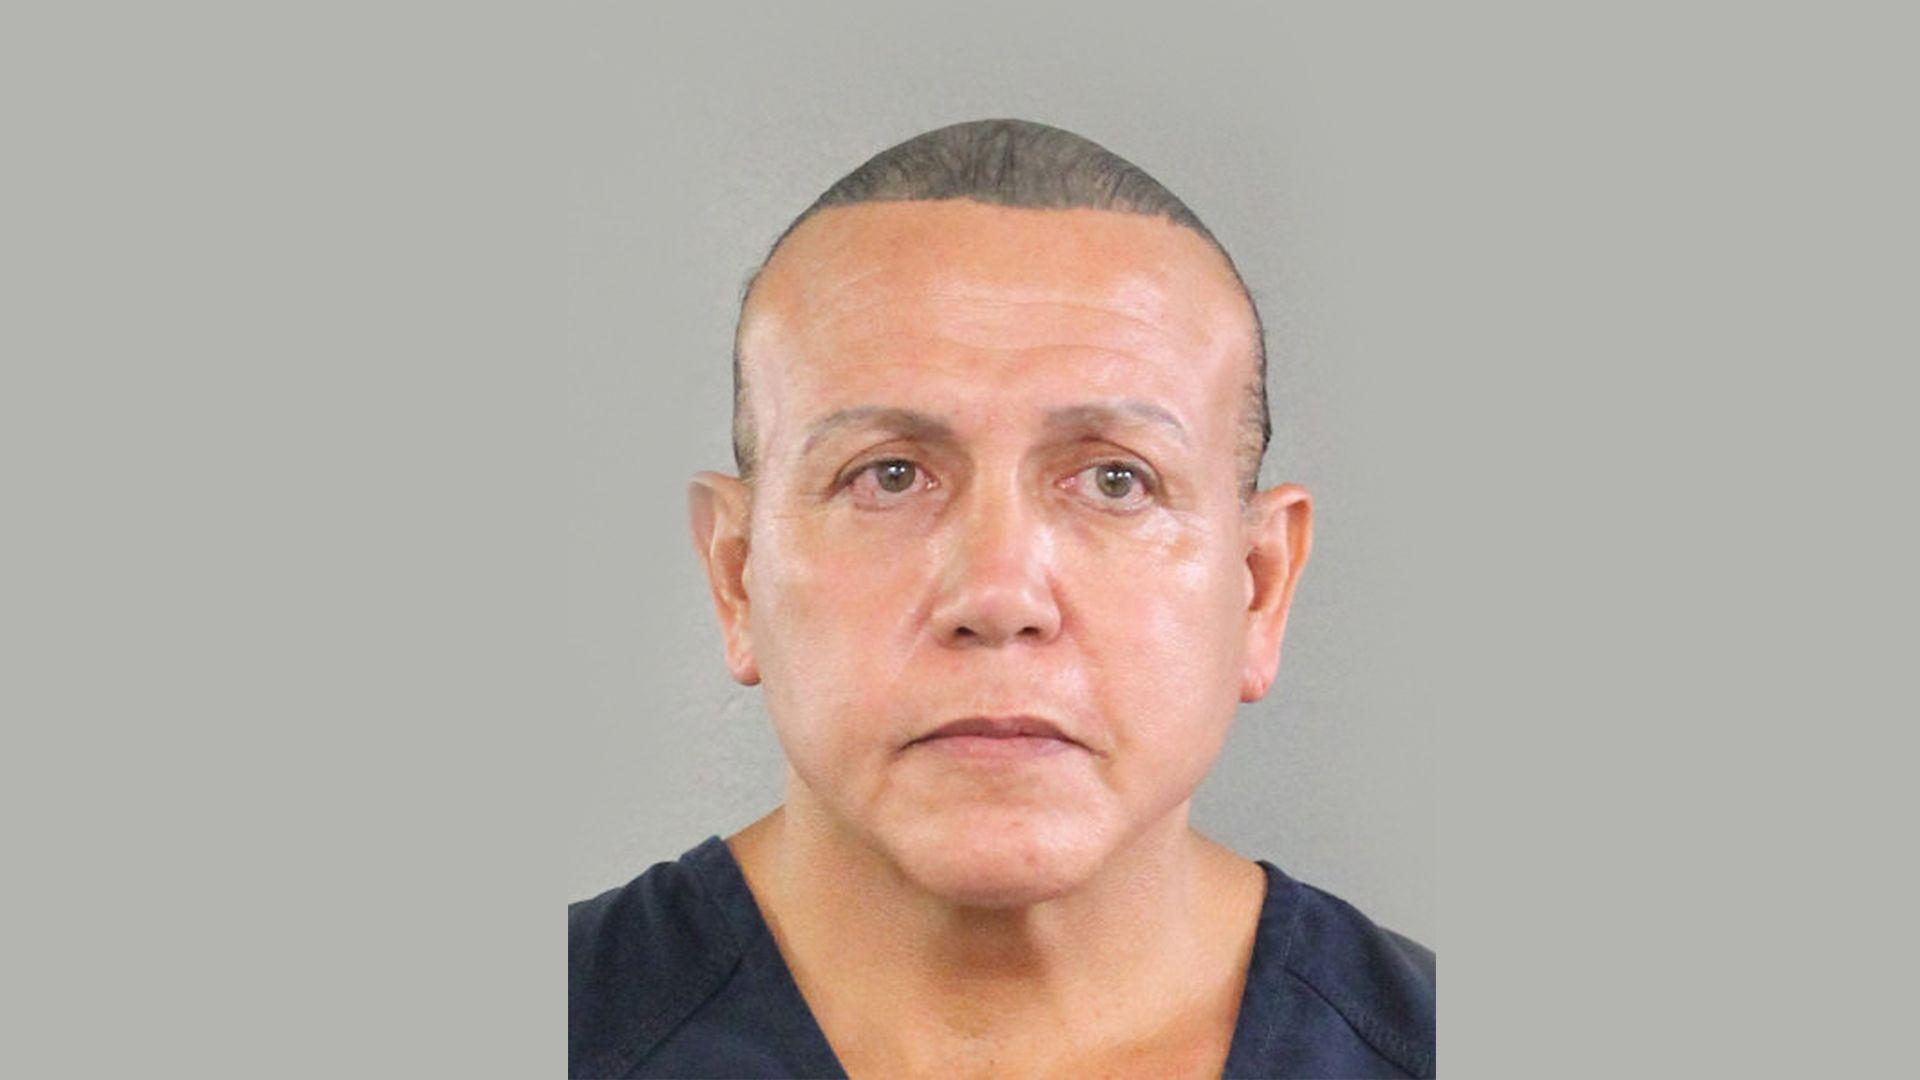 Mugshot of mail bomb suspect Cesar Sayoc